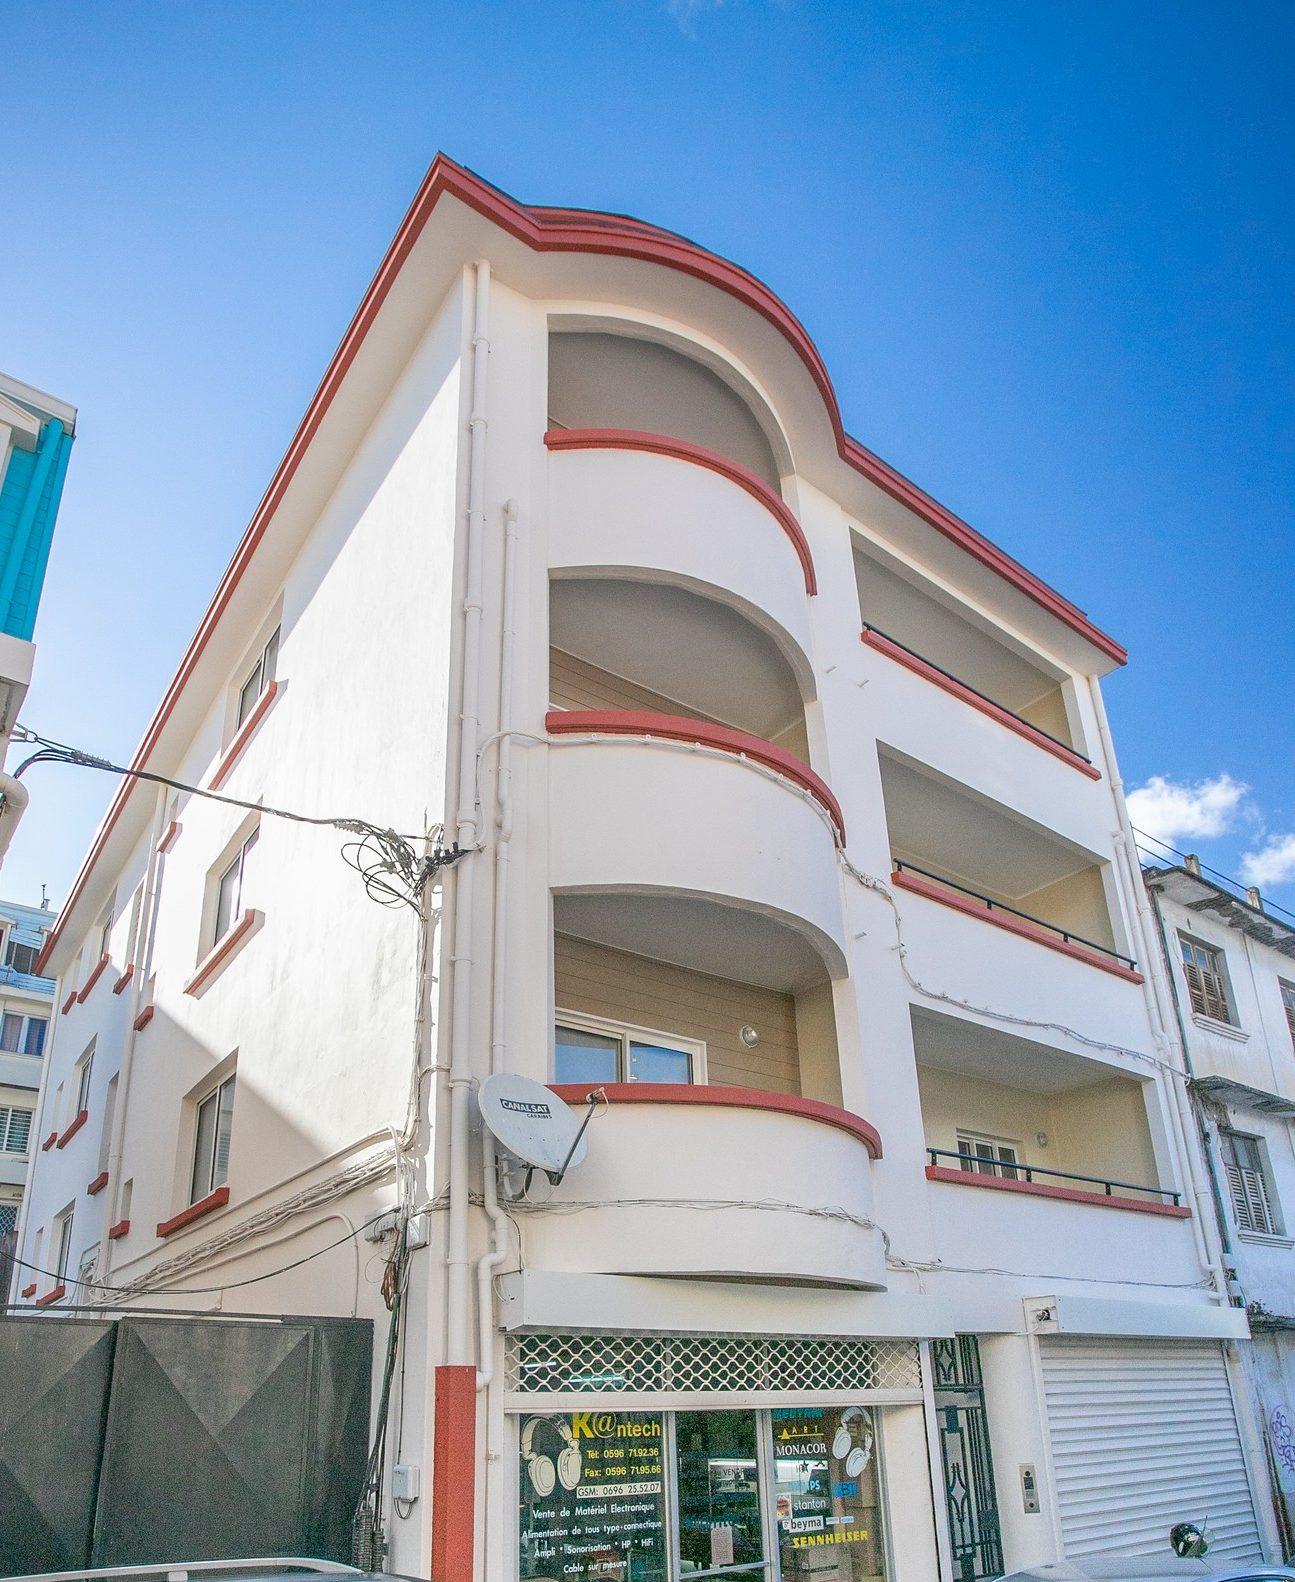 arcavs residence fdf num. 01 – 108-web